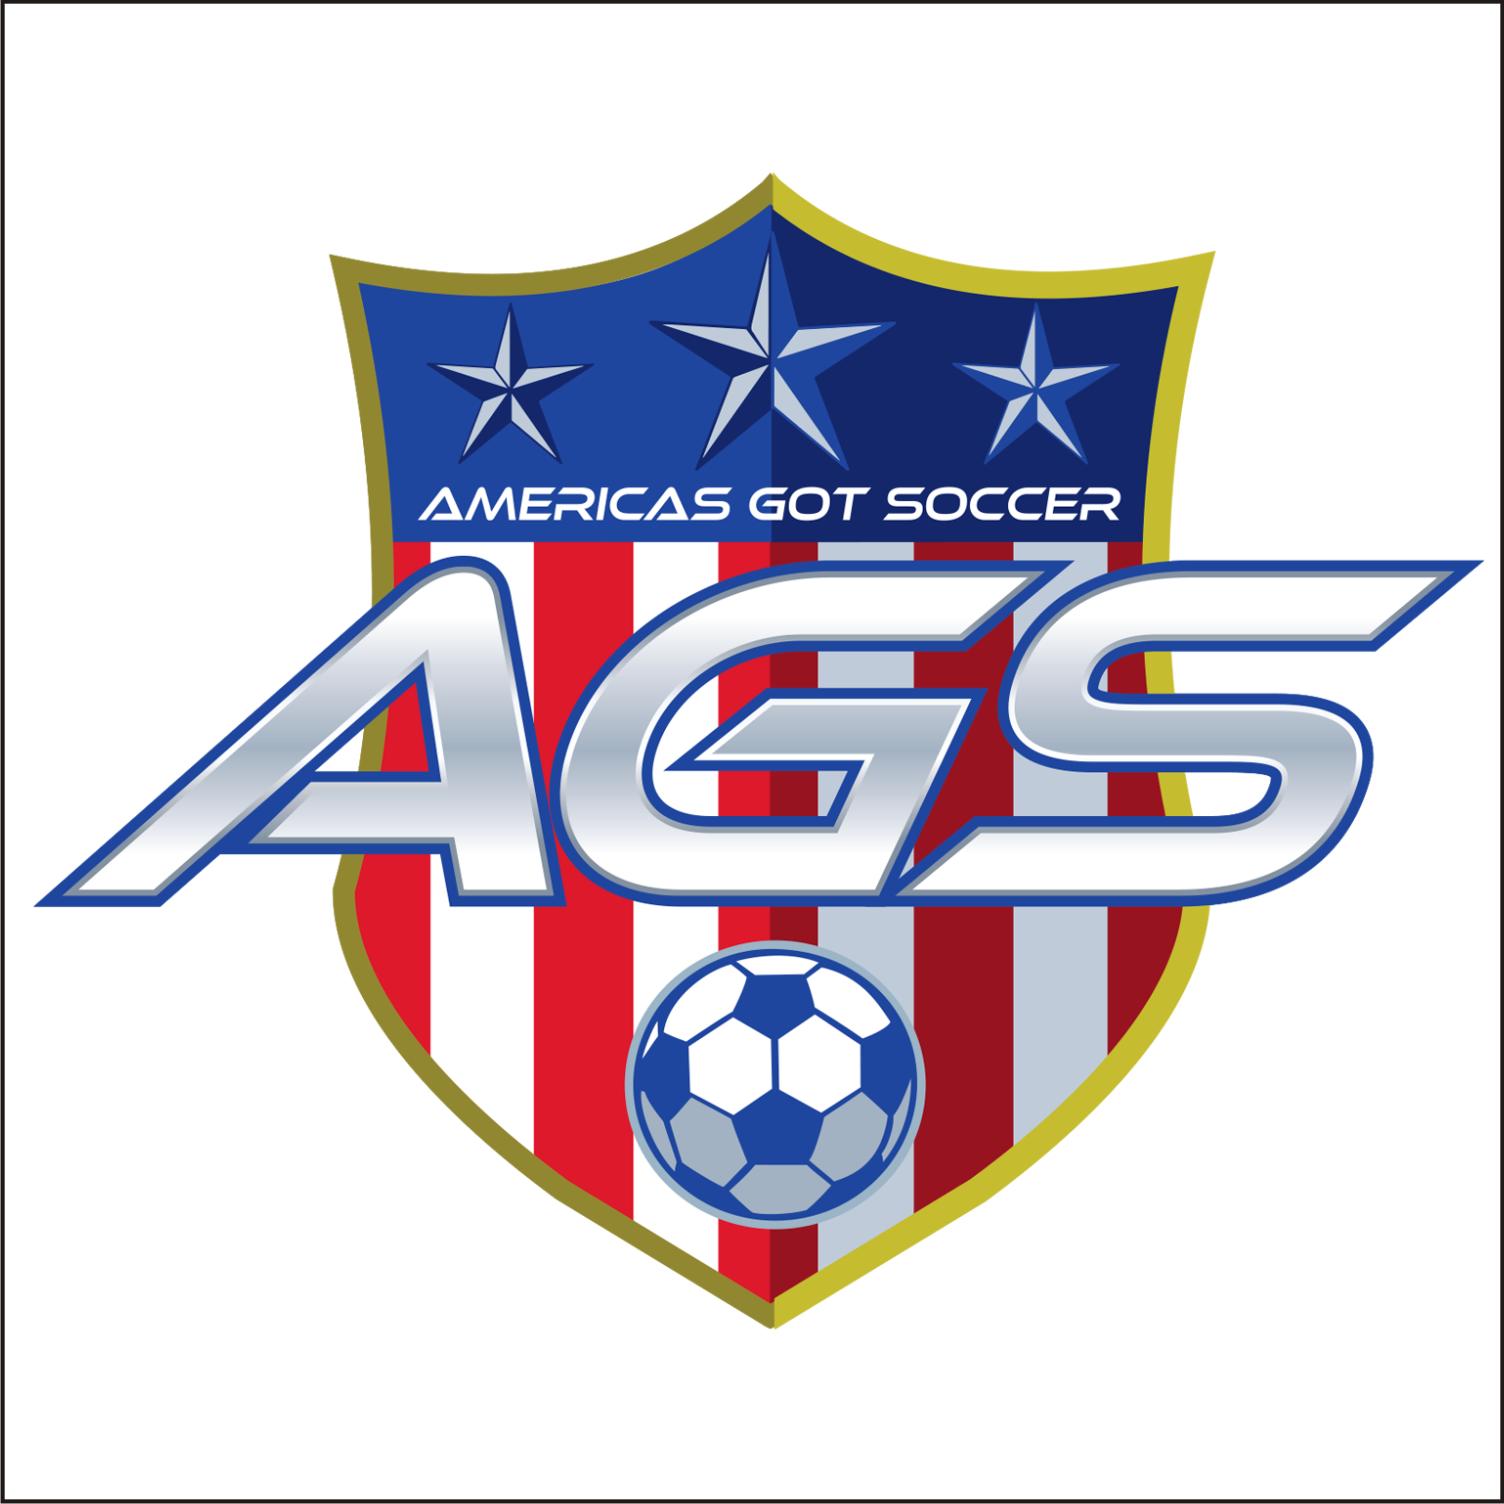 americas got soccer indoor oakland park fl logo